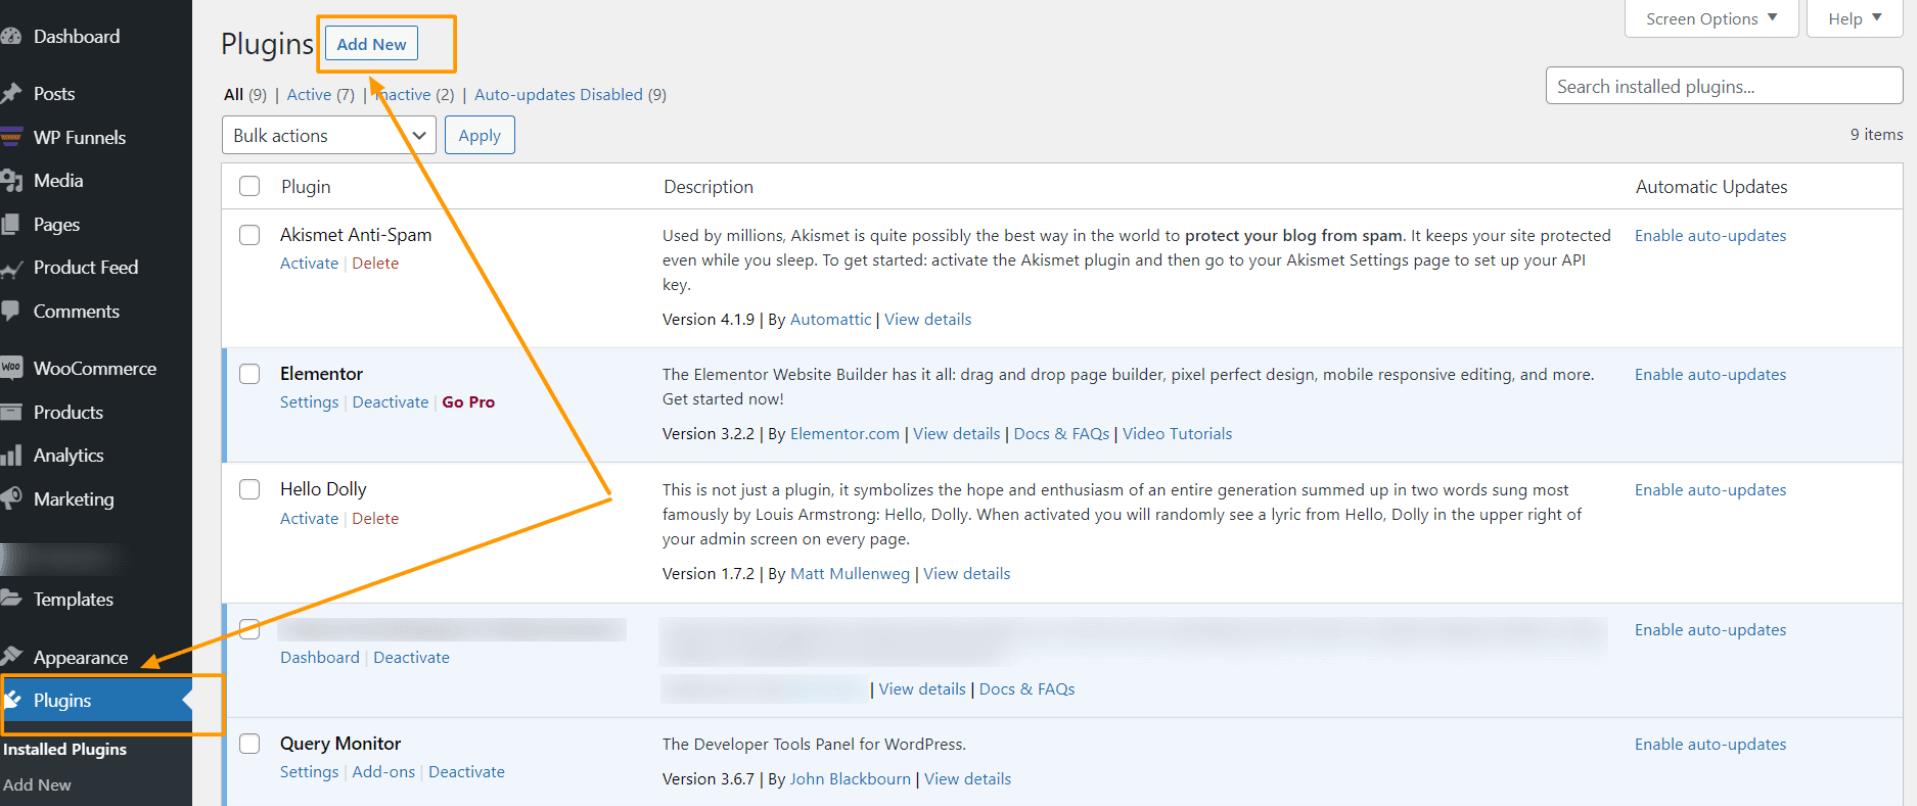 WordPress Dashboard - Add New Plugin